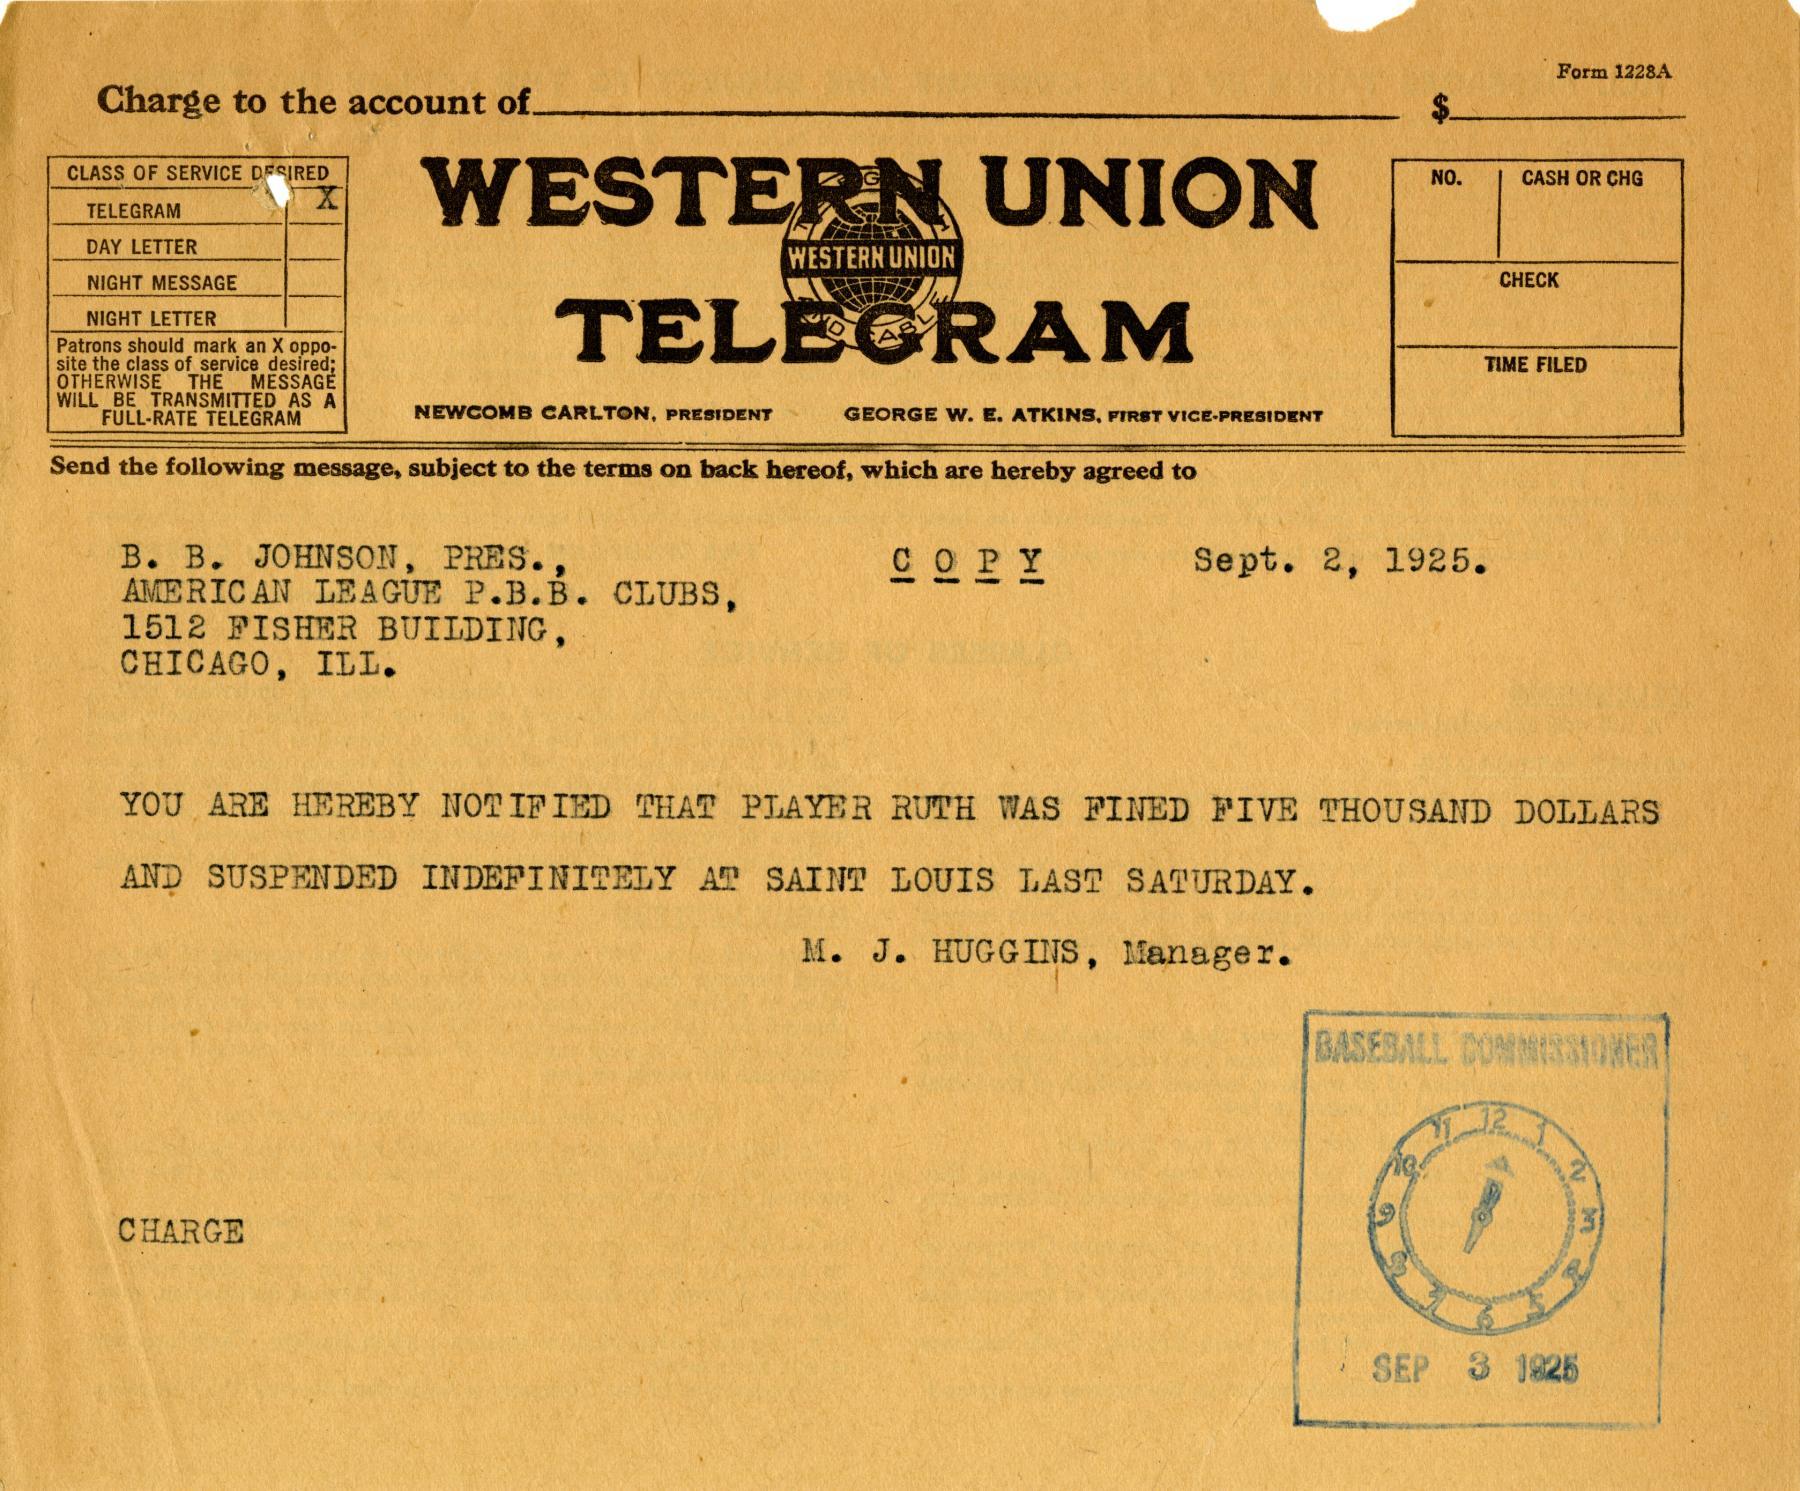 Telegram sent by Miller Huggins to Ban Johnson regarding Babe Ruth's $5,000 fine. BL-439-2008 (National Baseball Hall of Fame Library)